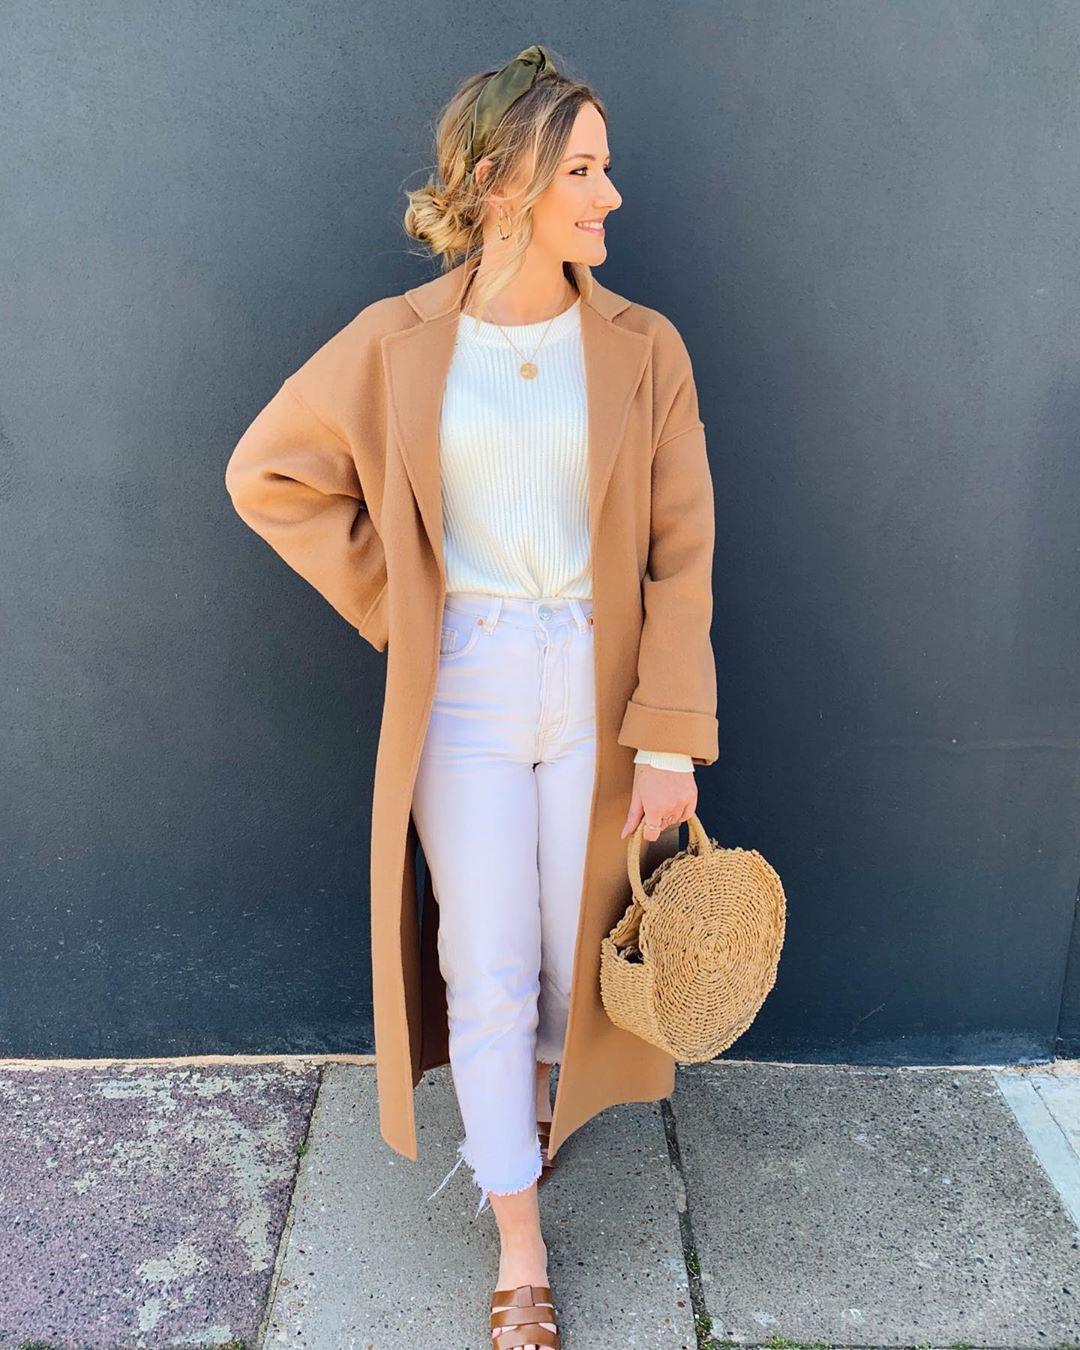 coat with patch pockets de Zara sur itsemilyjames